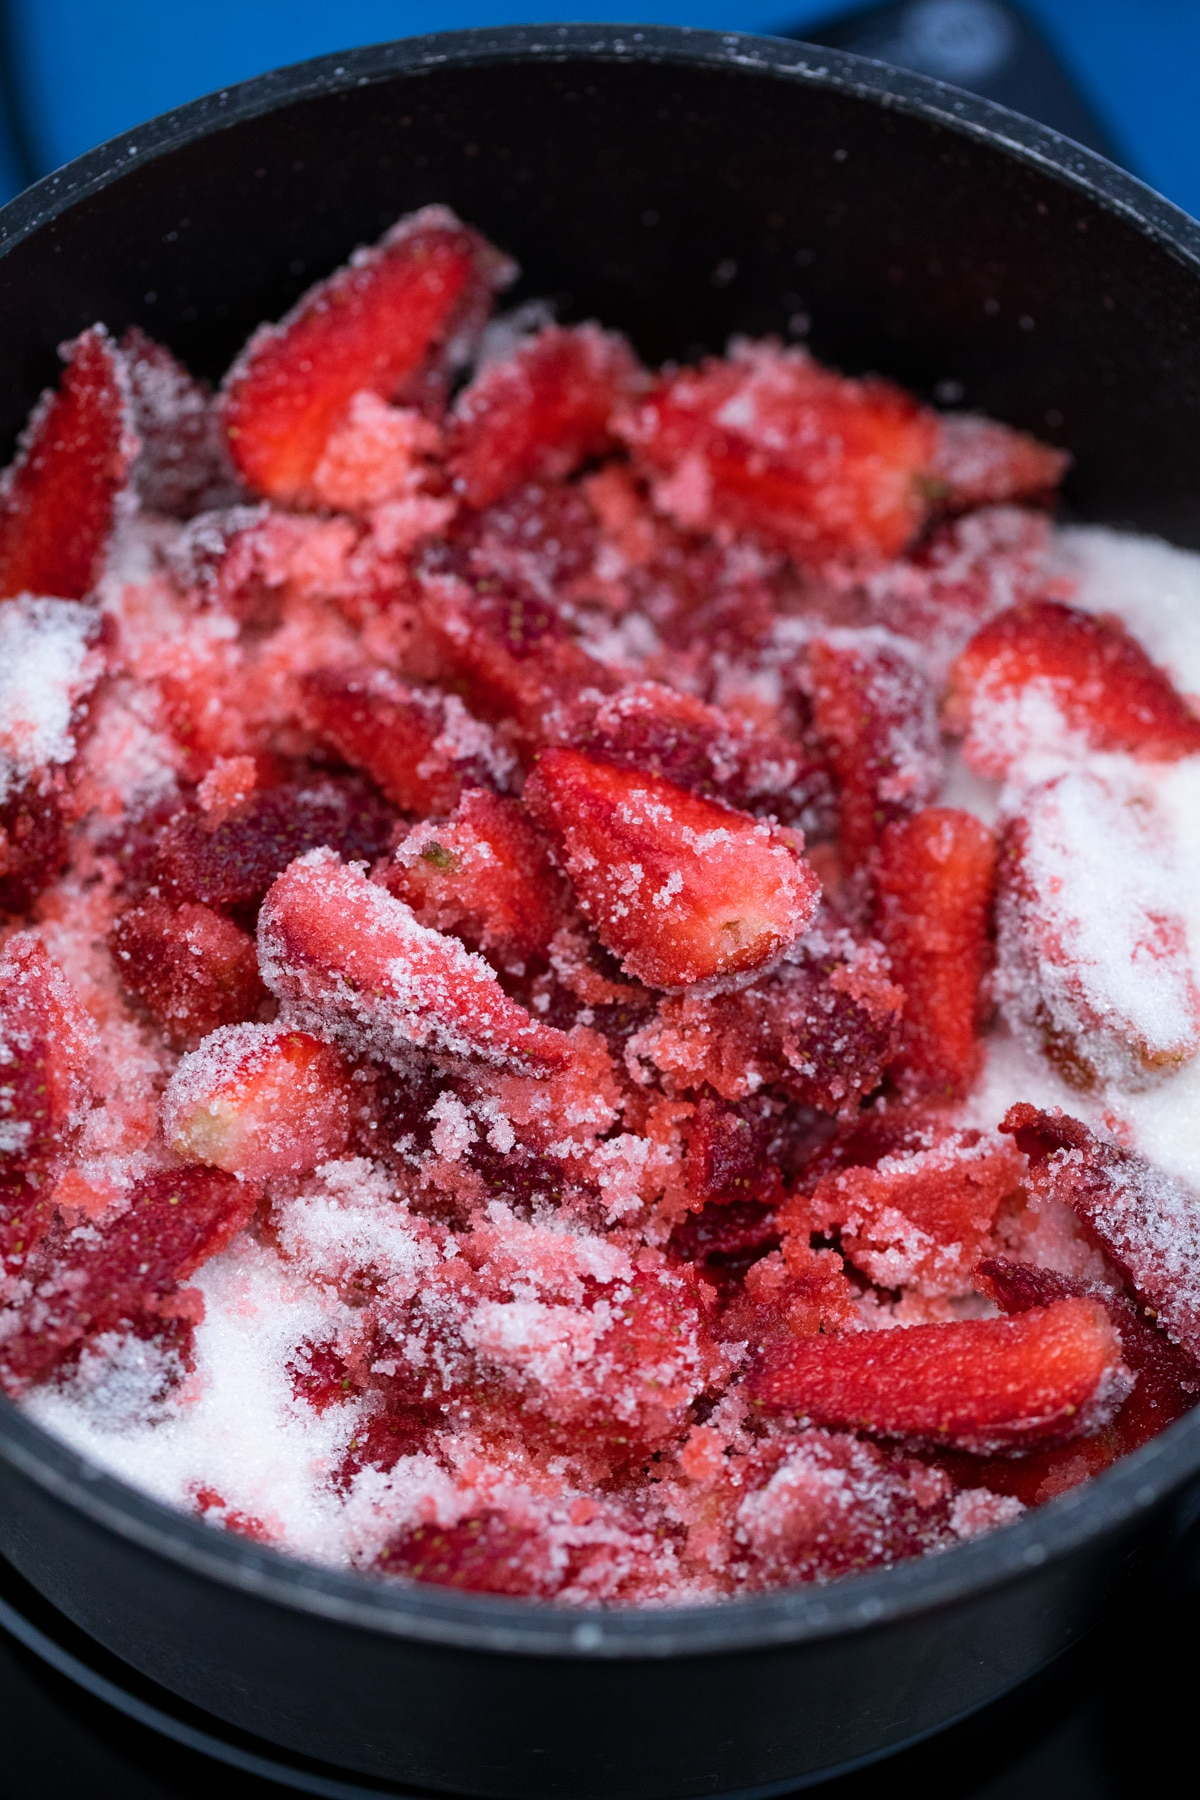 Strawberries coated in sugar in large black pot